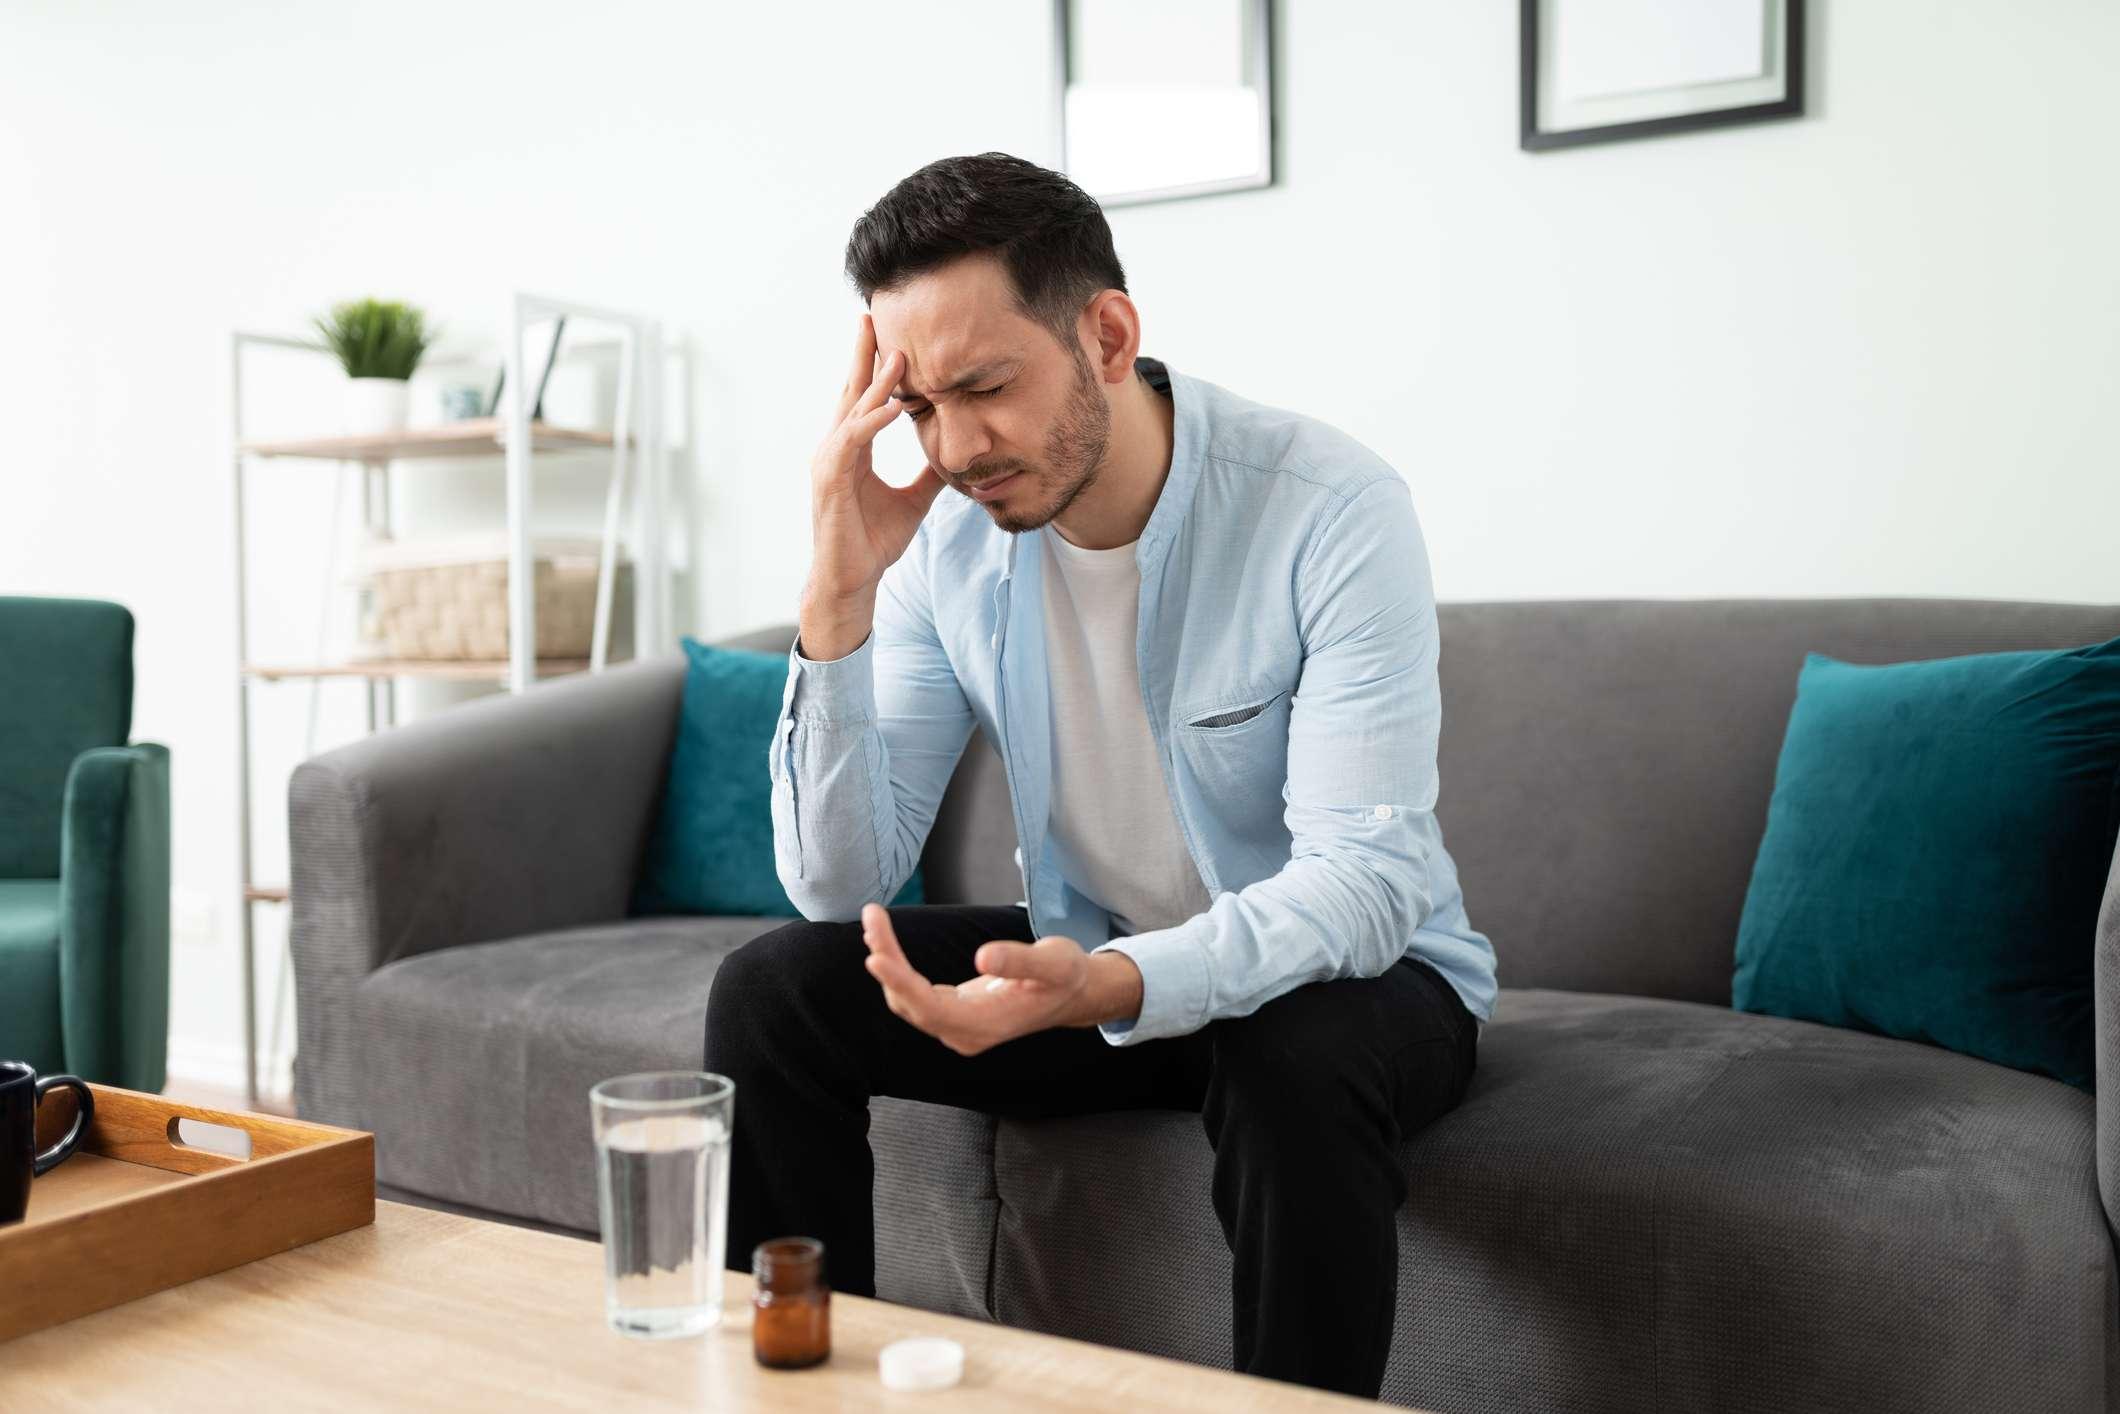 Young man taking pills for a headache